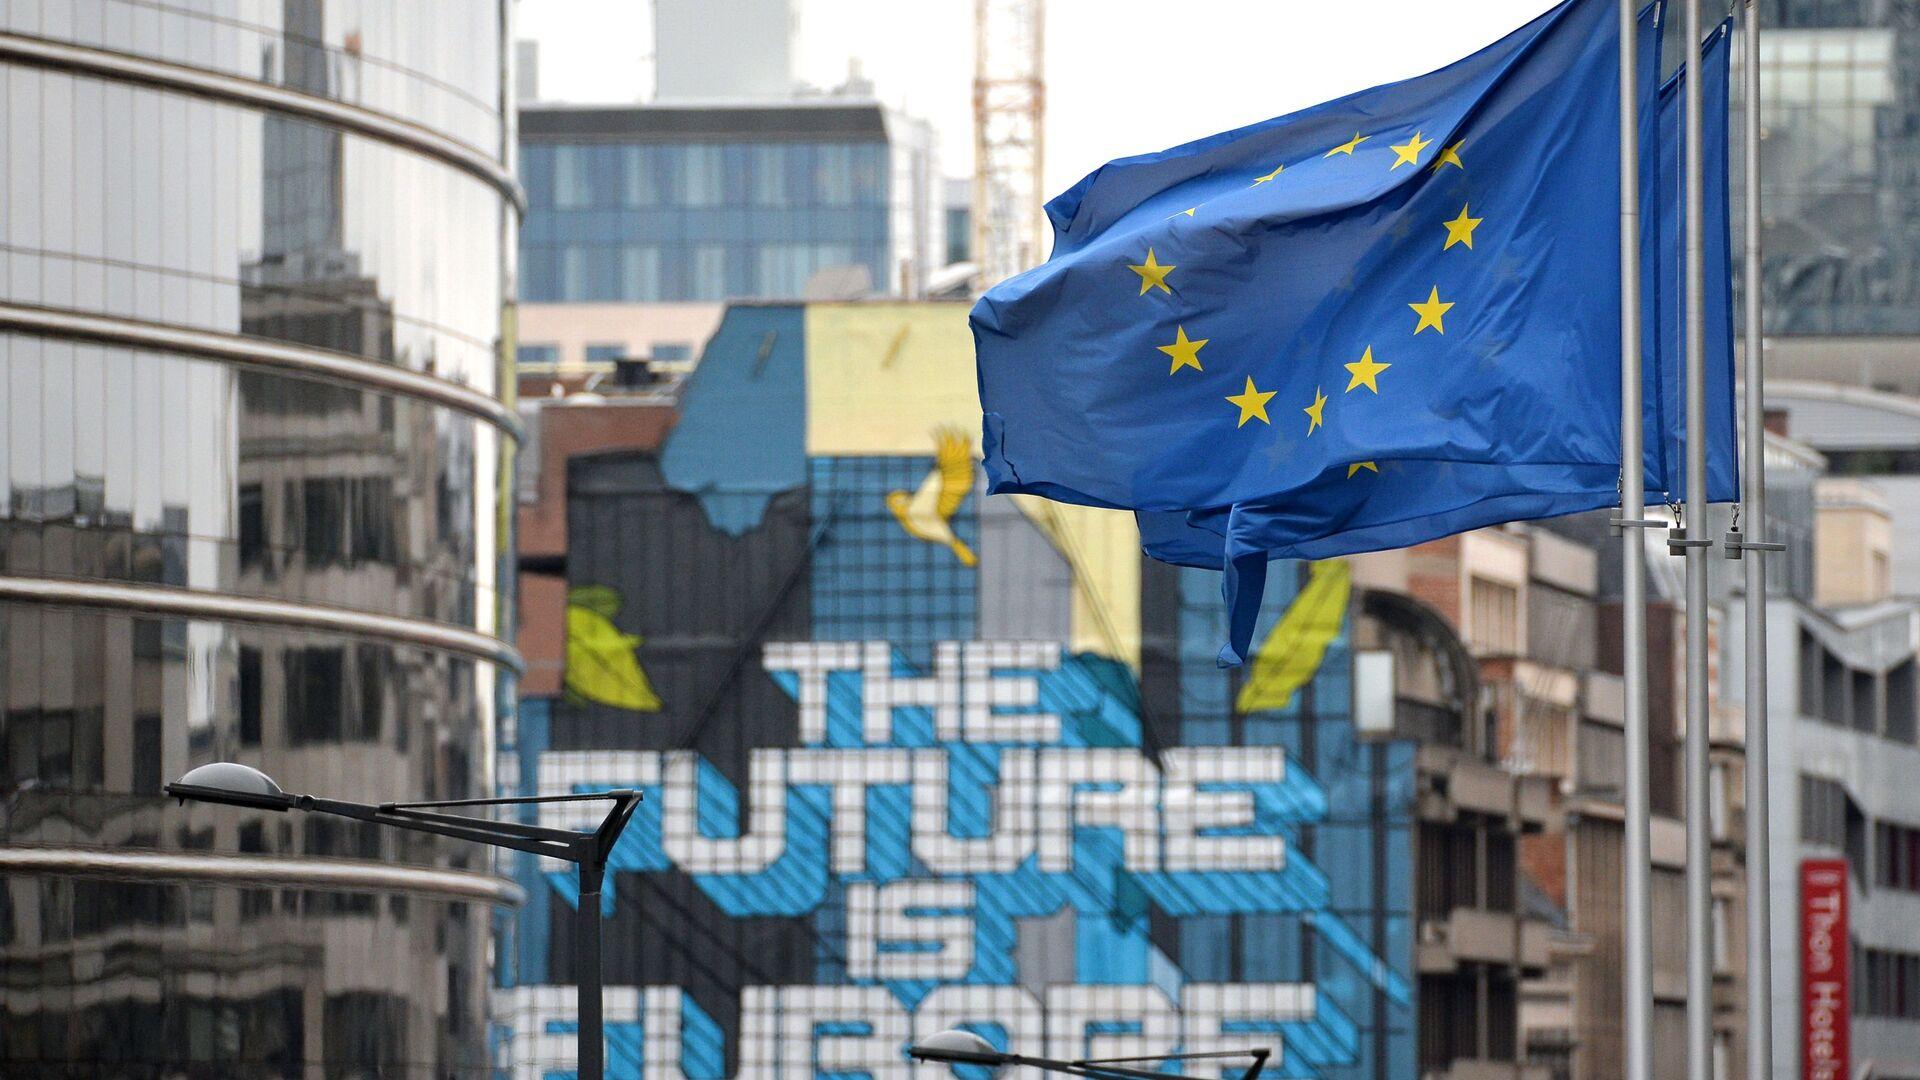 Siedziba UE w Brukseli - Sputnik Polska, 1920, 12.02.2021